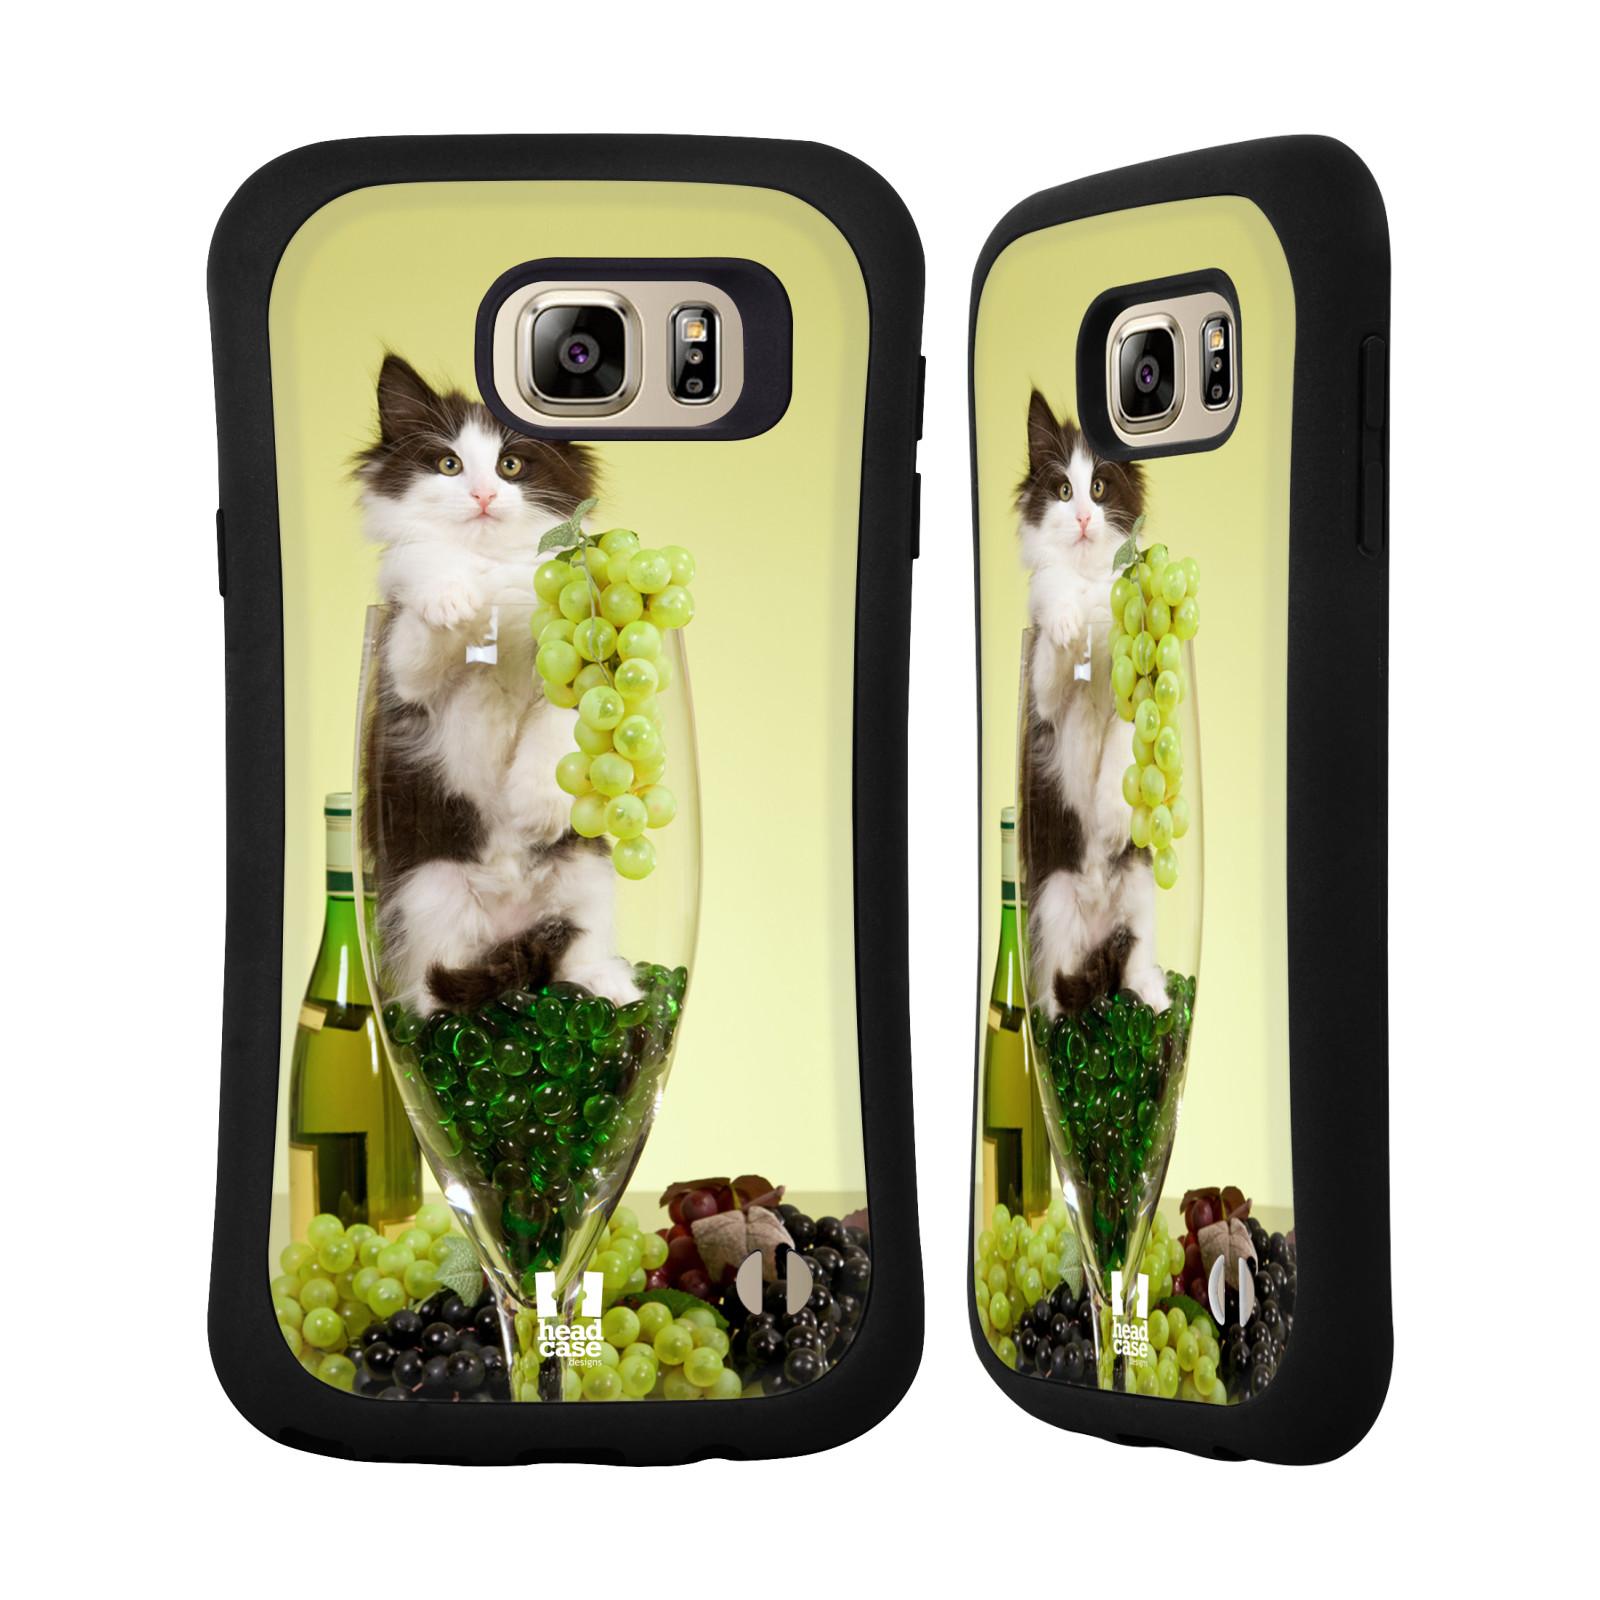 HEAD CASE DESIGNS FUNNY ANIMALS HYBRID CASE FOR SAMSUNG PHONES